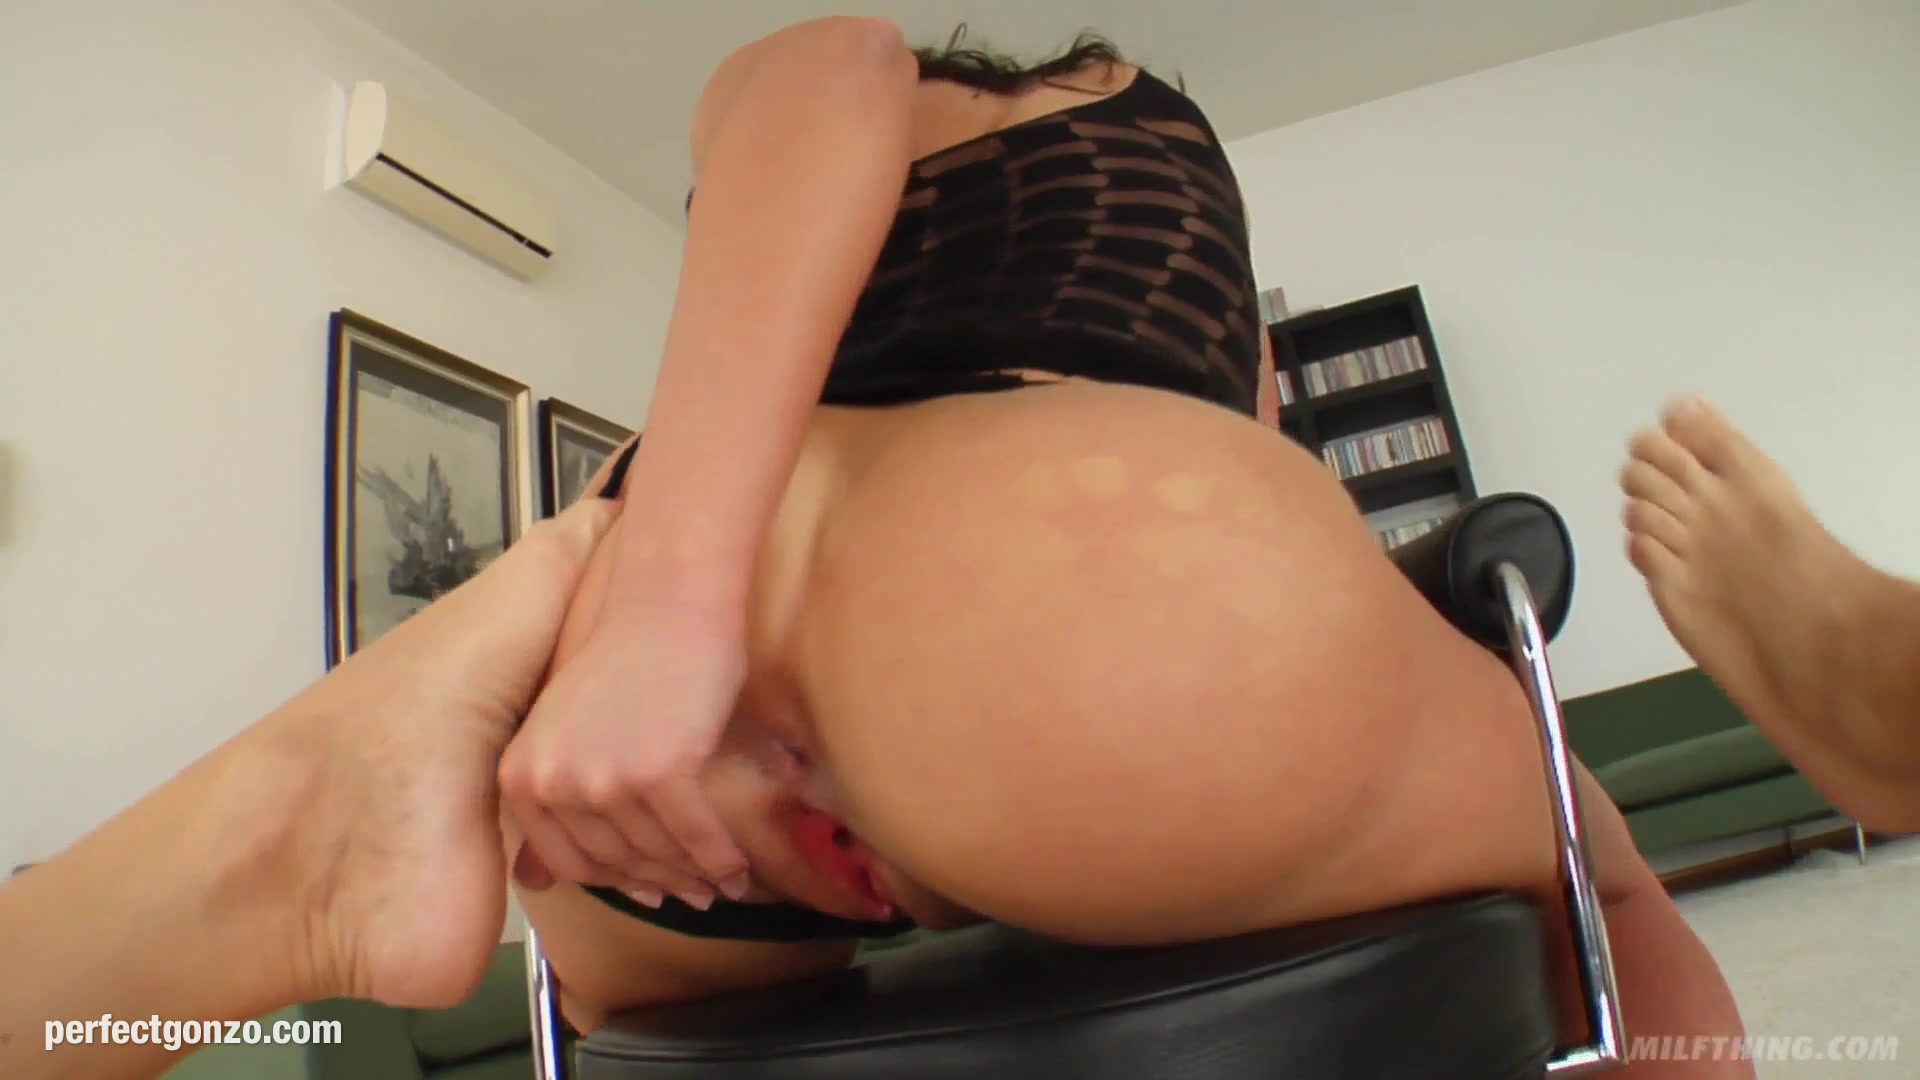 Porn Pics & Movies Victoria winterford